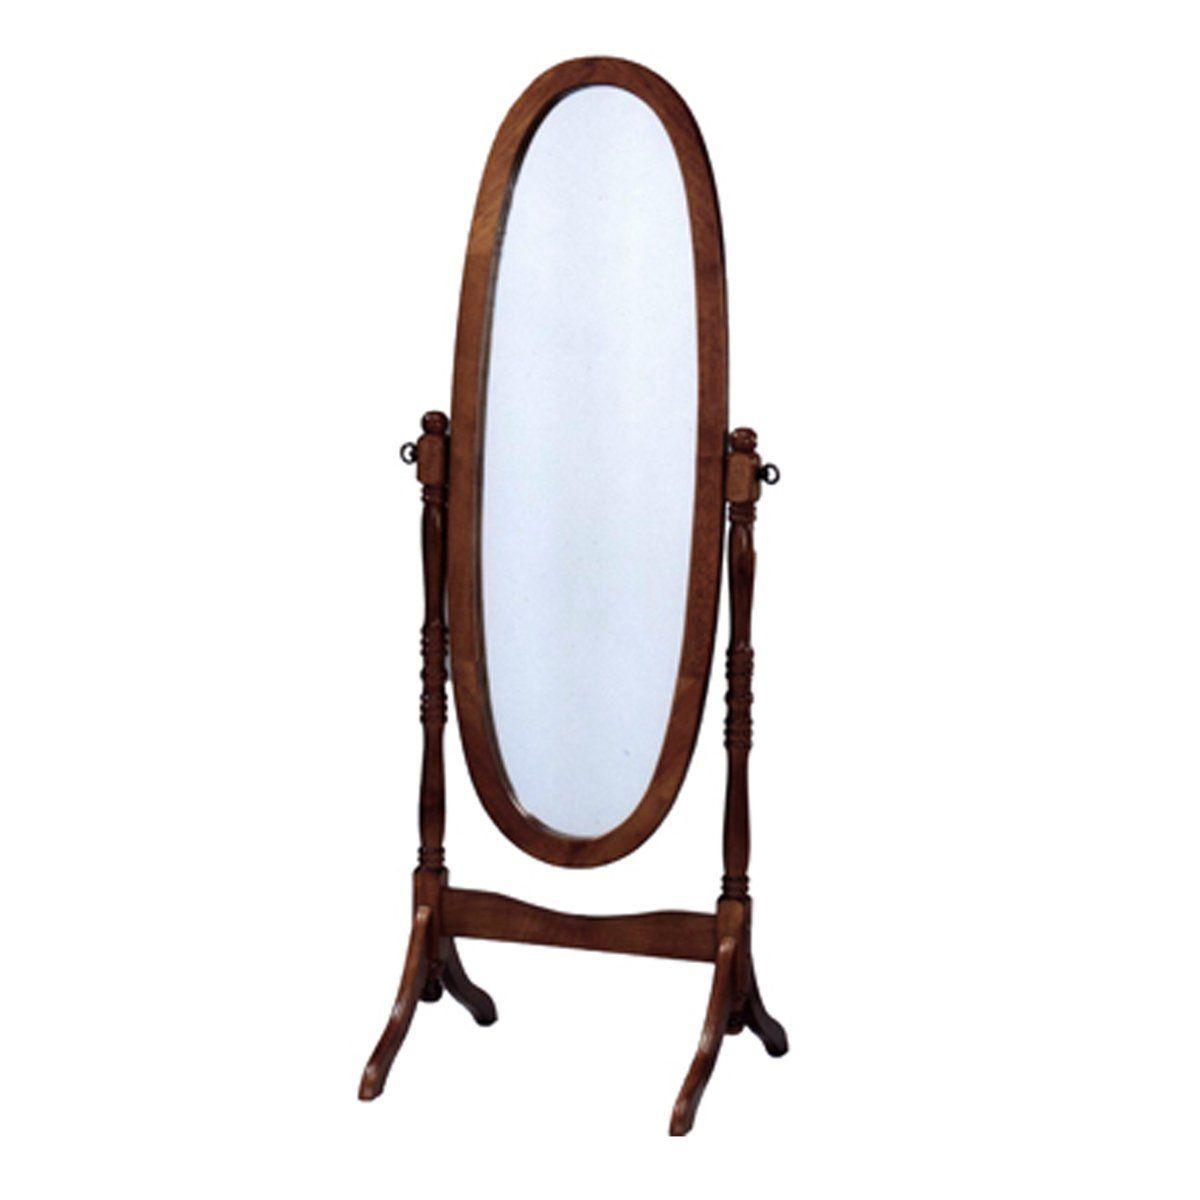 Milton Greens Stars Eleanor Full Length Mirror Oak To view